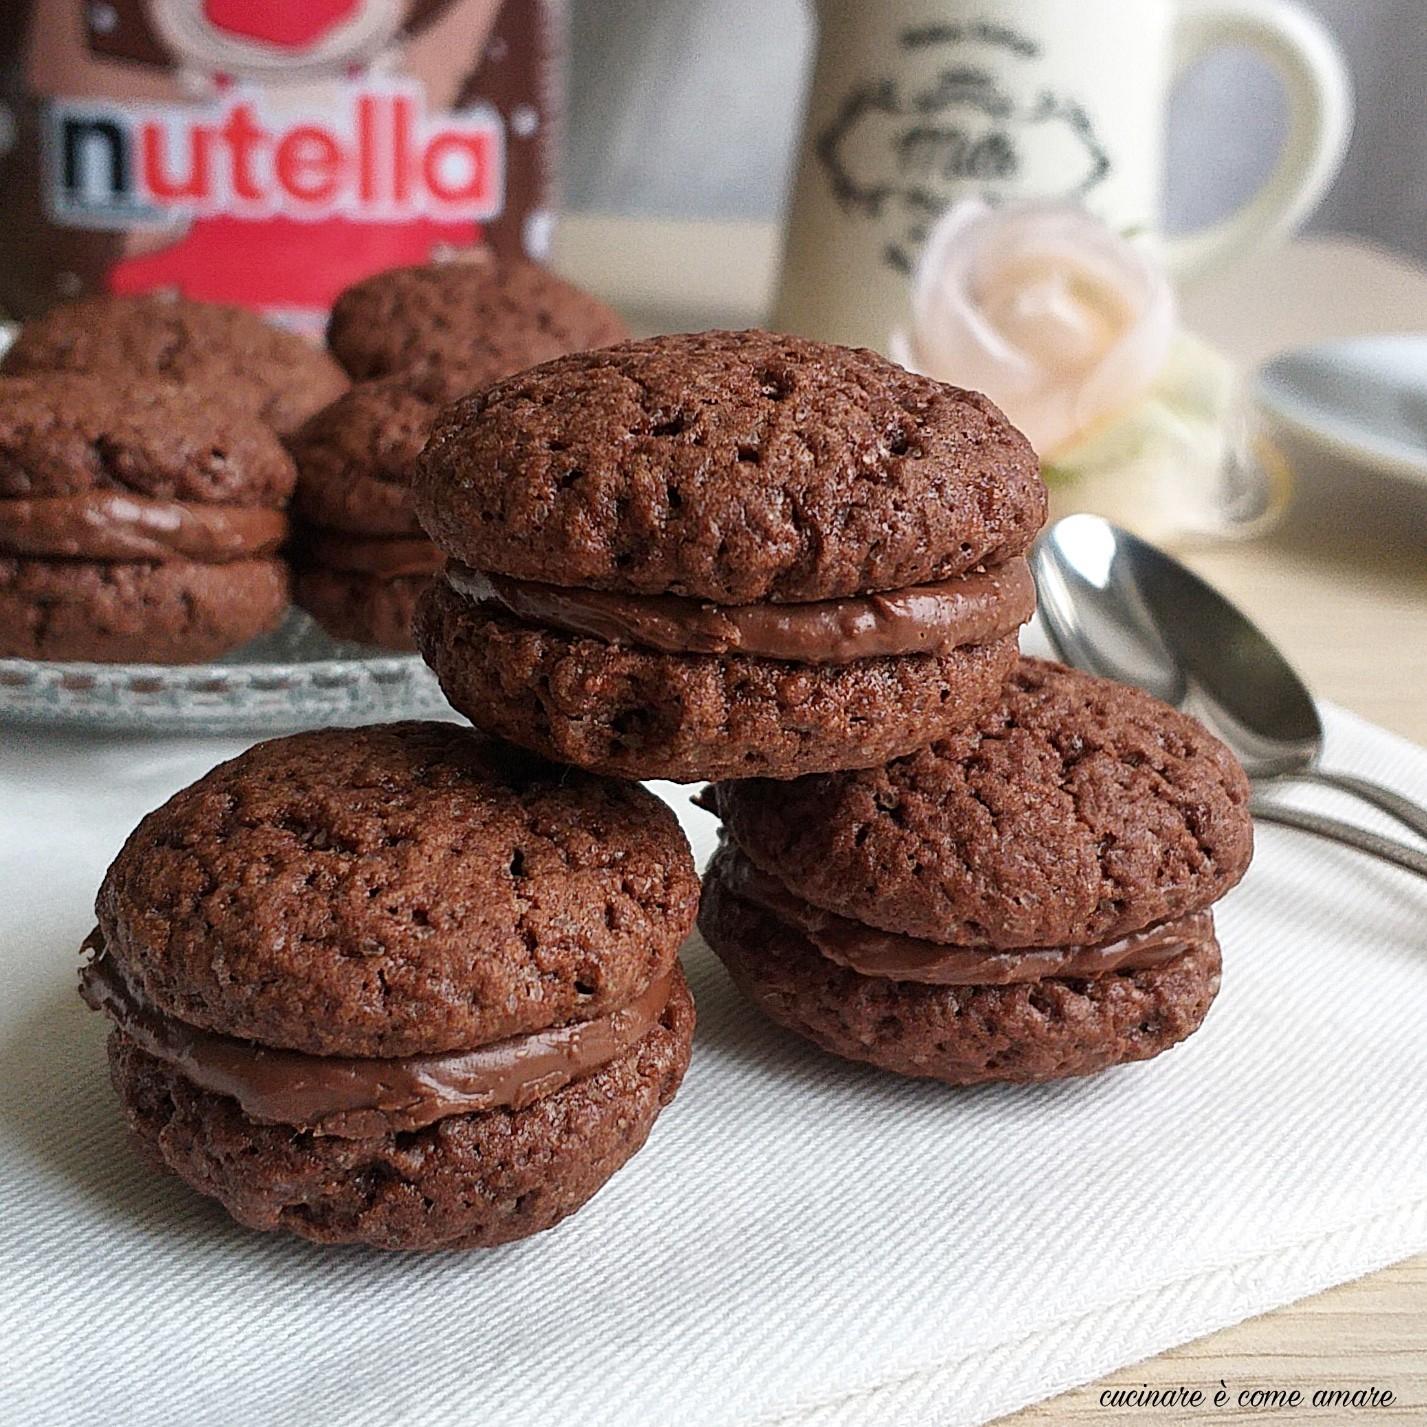 Biscotto bacio cacao alla nutella